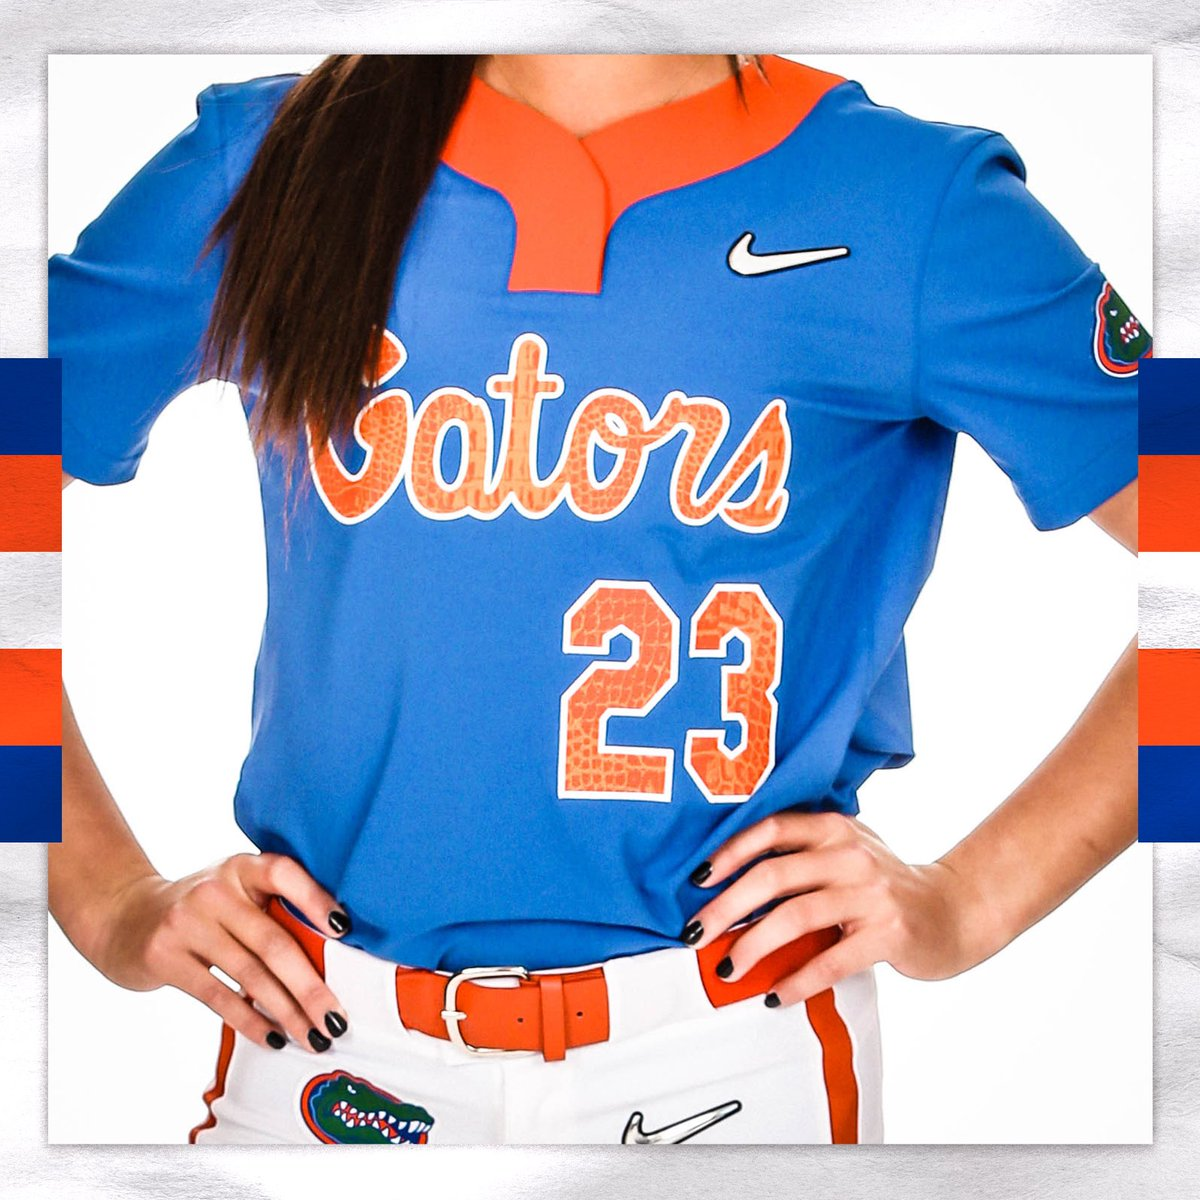 online store 426cc b7b39 Florida Softball Uniforms — UNISWAG